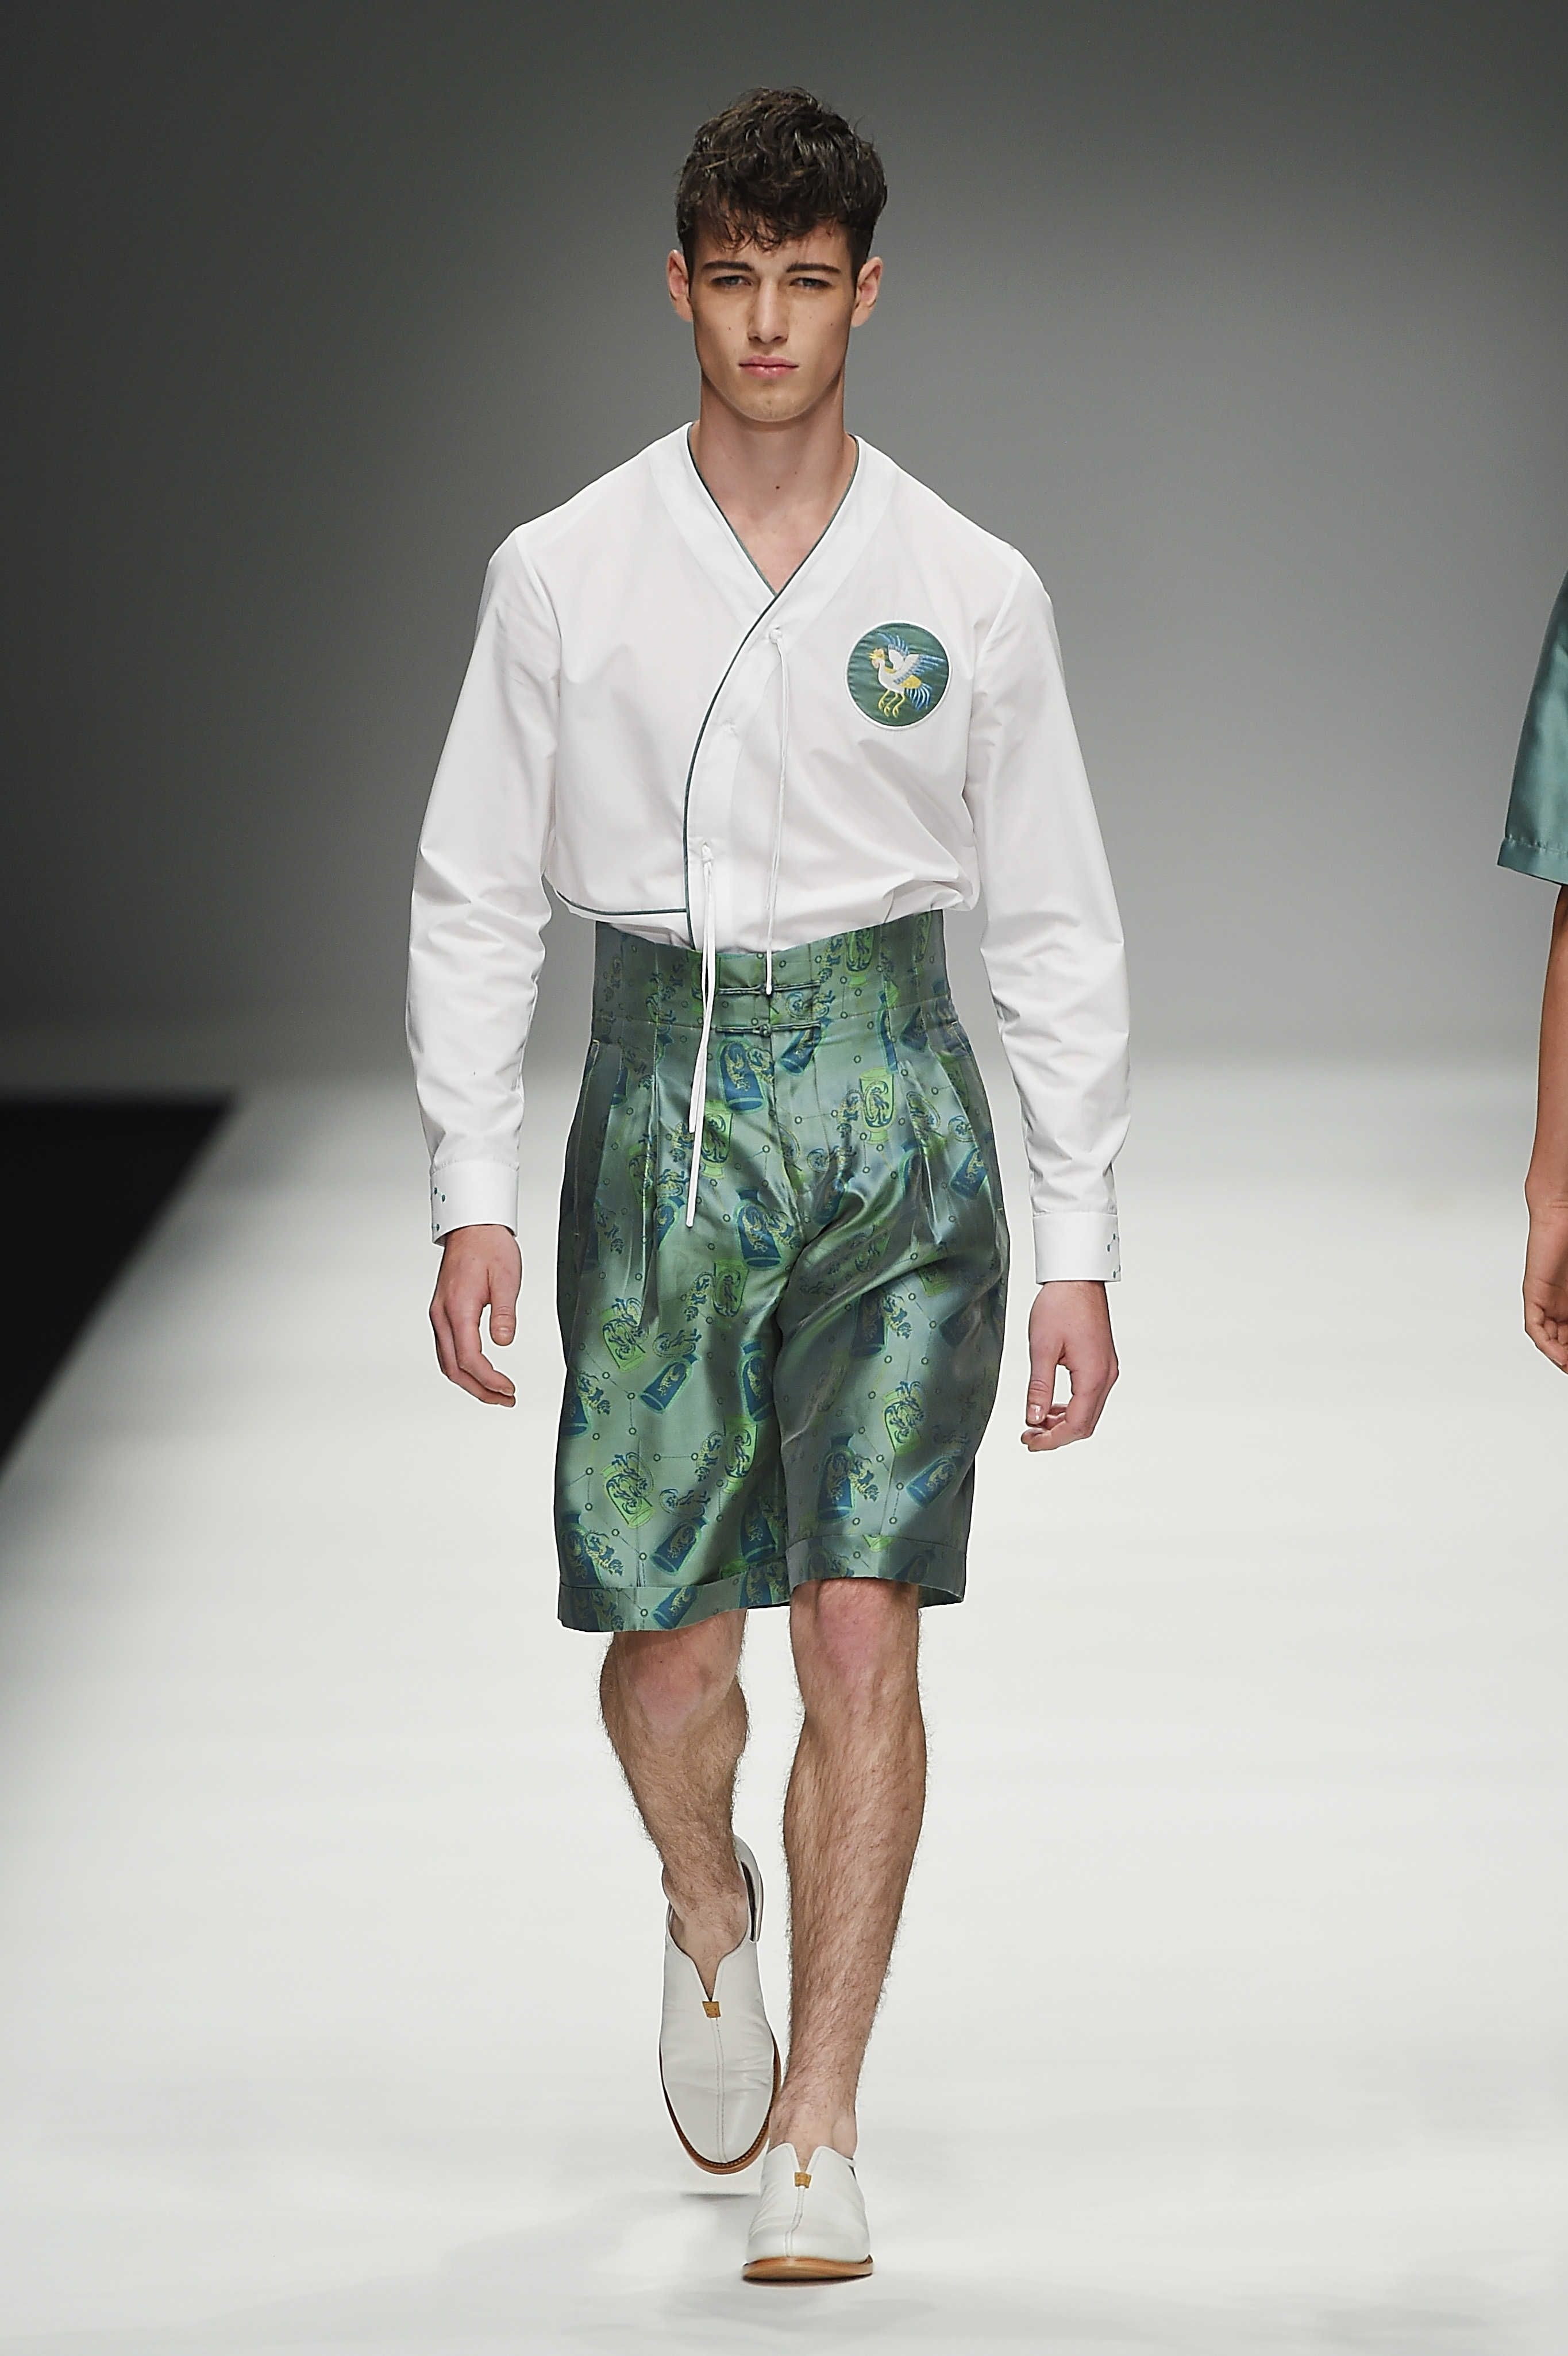 Zeng Fengfei SpringSummer 2016 Collection - Milan Fashion Week - DerriusPierreCom (10)